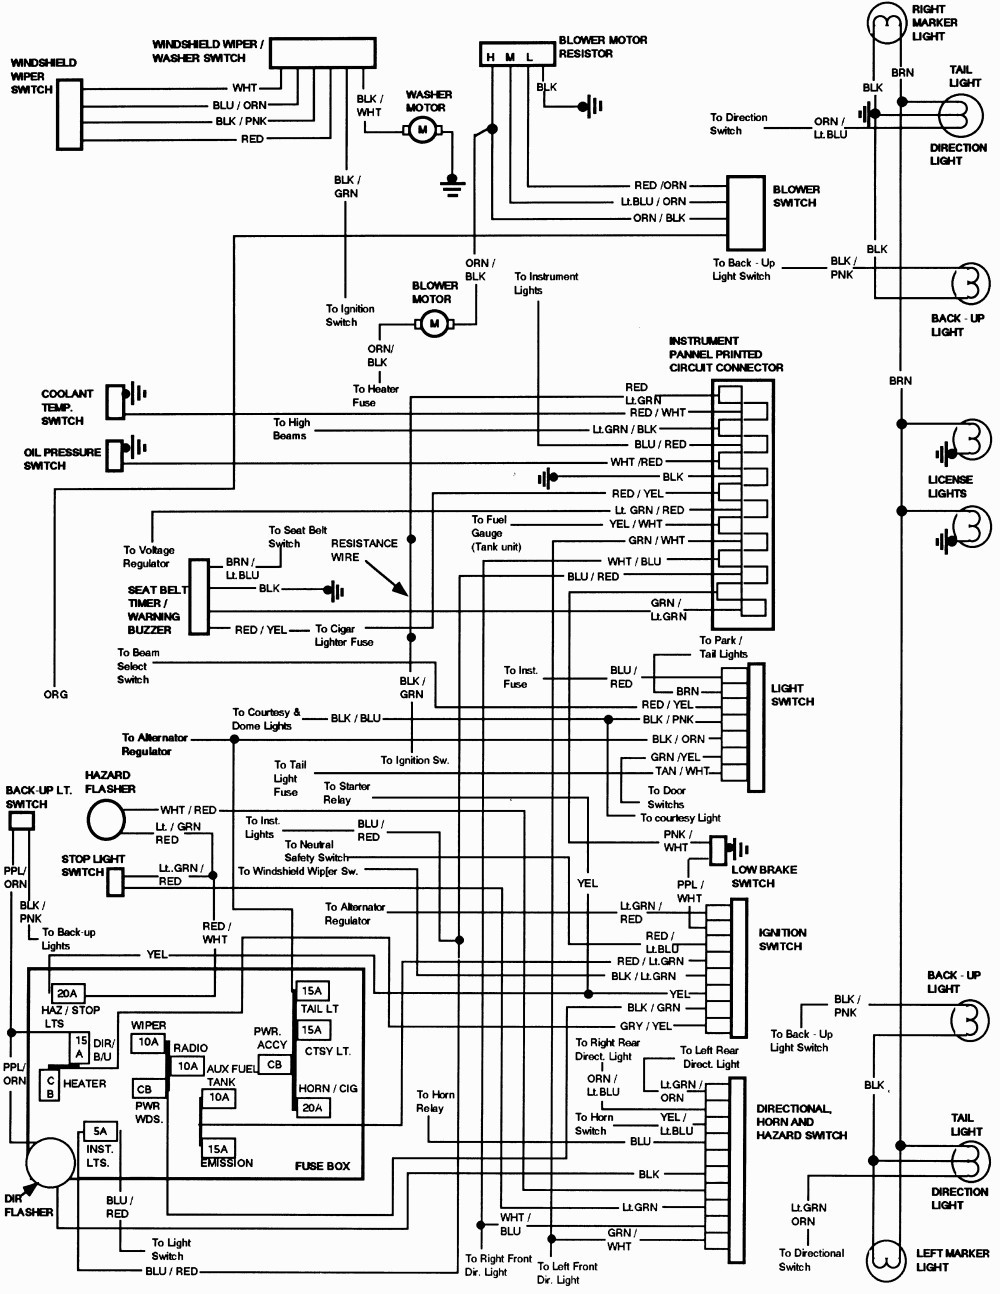 hight resolution of starter solenoid wiring diagram ford inspirational wiring diagram 2000 ford starter relay diagram camry starter relay